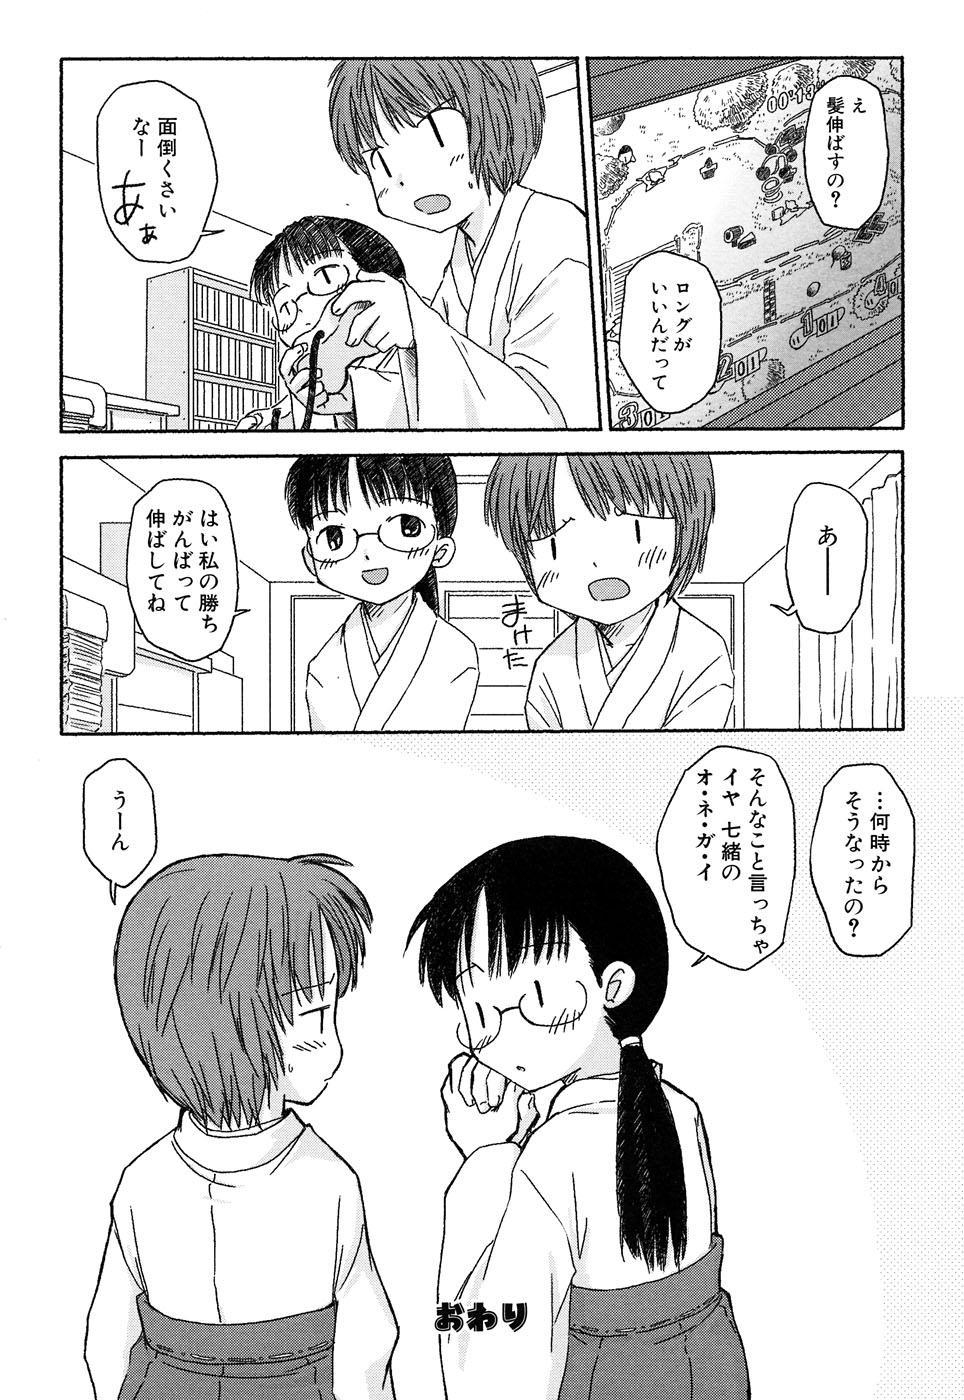 Fechikko VS Series ROUND.2 Miko San VS Maid San 68